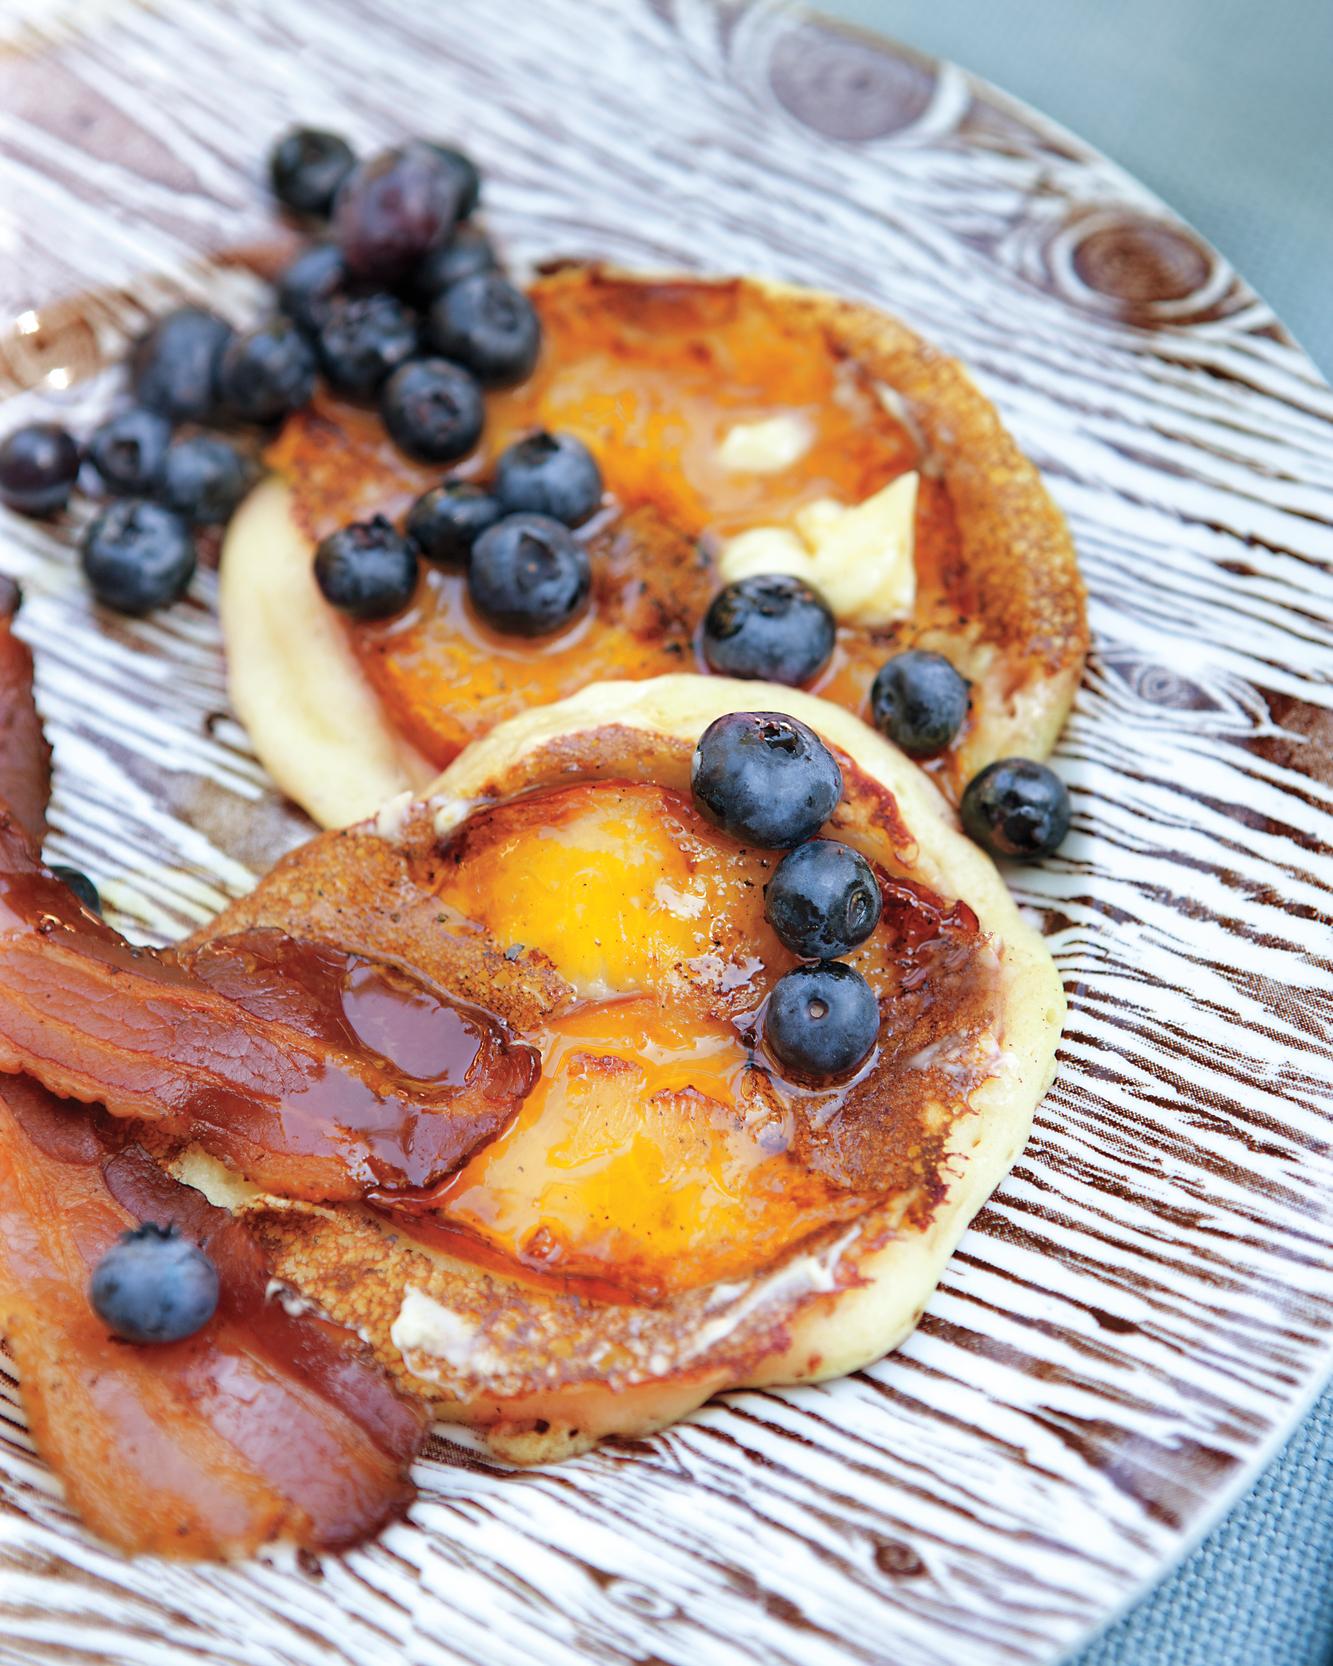 maine-birthday-pancakes-mld108042.jpg